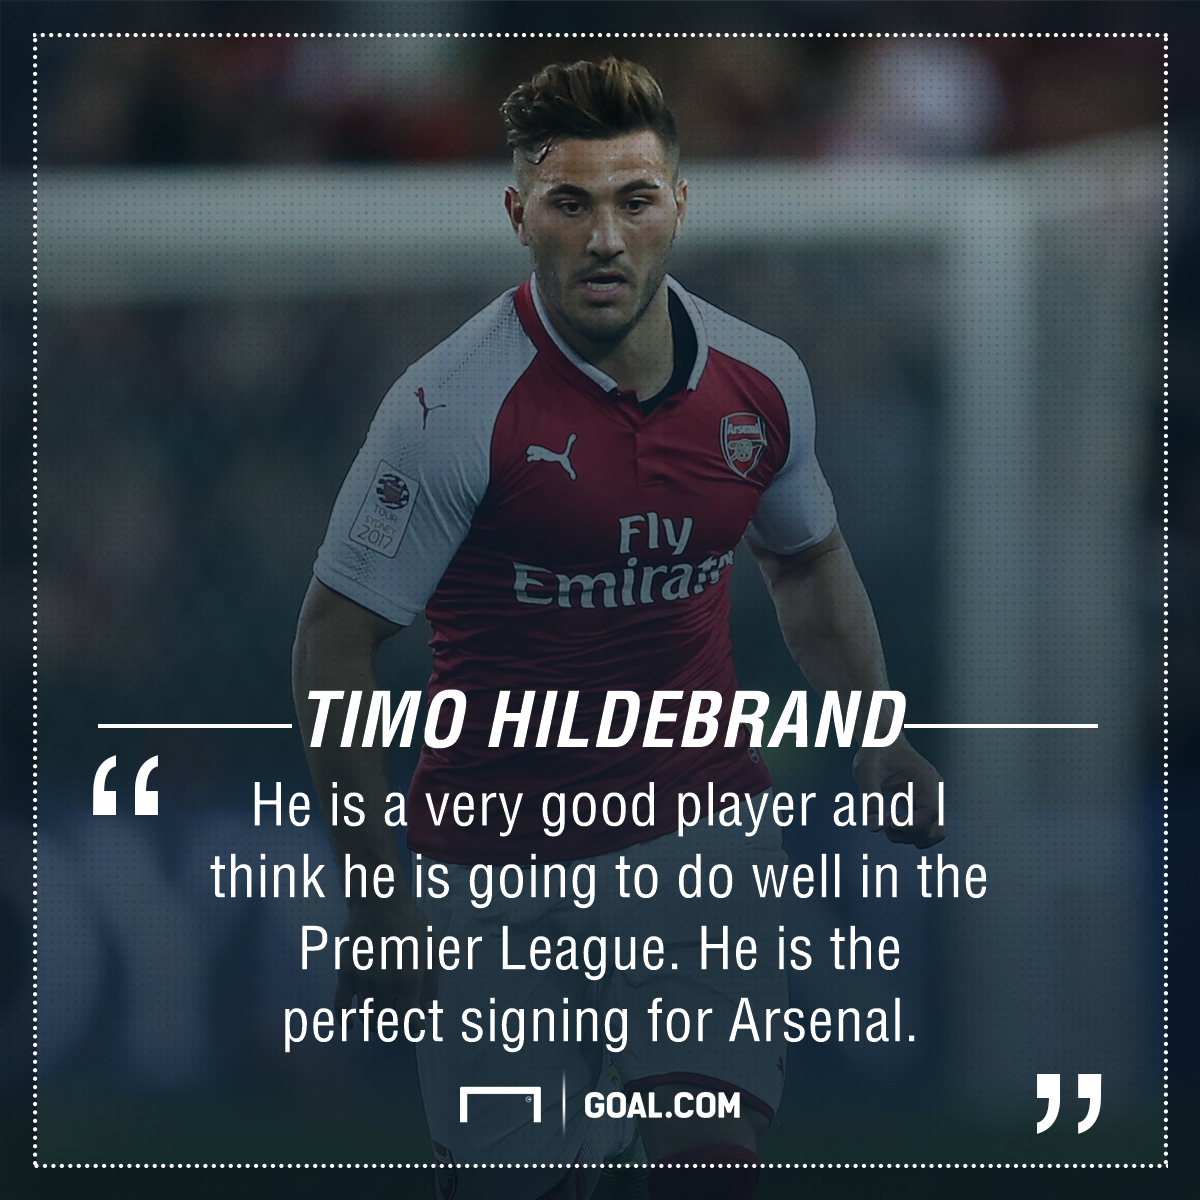 Head at Arsenal? Watch Monaco's Thomas Lemar have a shocker against PSG